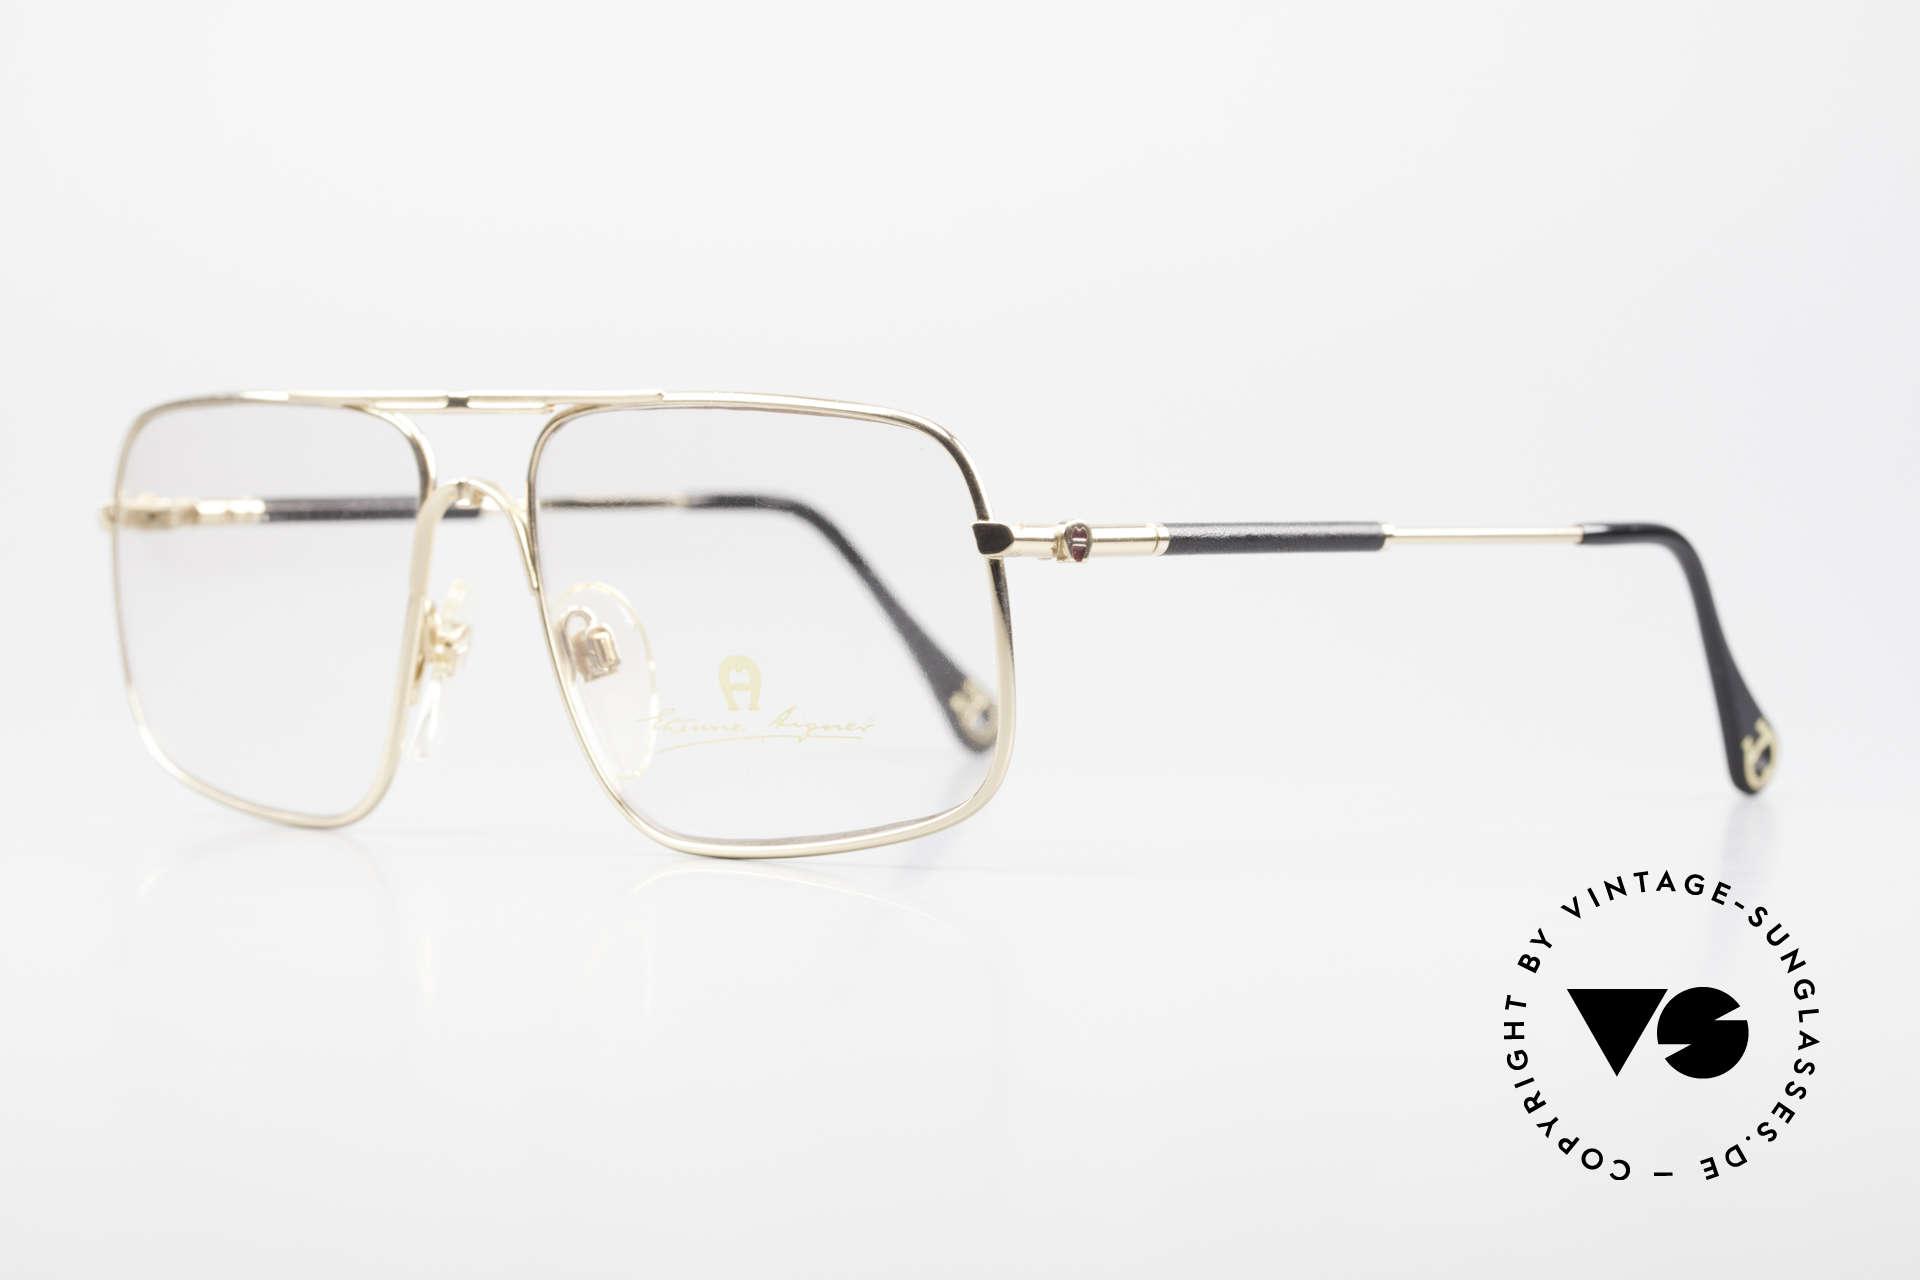 Aigner EA23 Rare 80's Vintage Eyeglasses, true luxury vintage eyewear - just precious & rare!, Made for Men